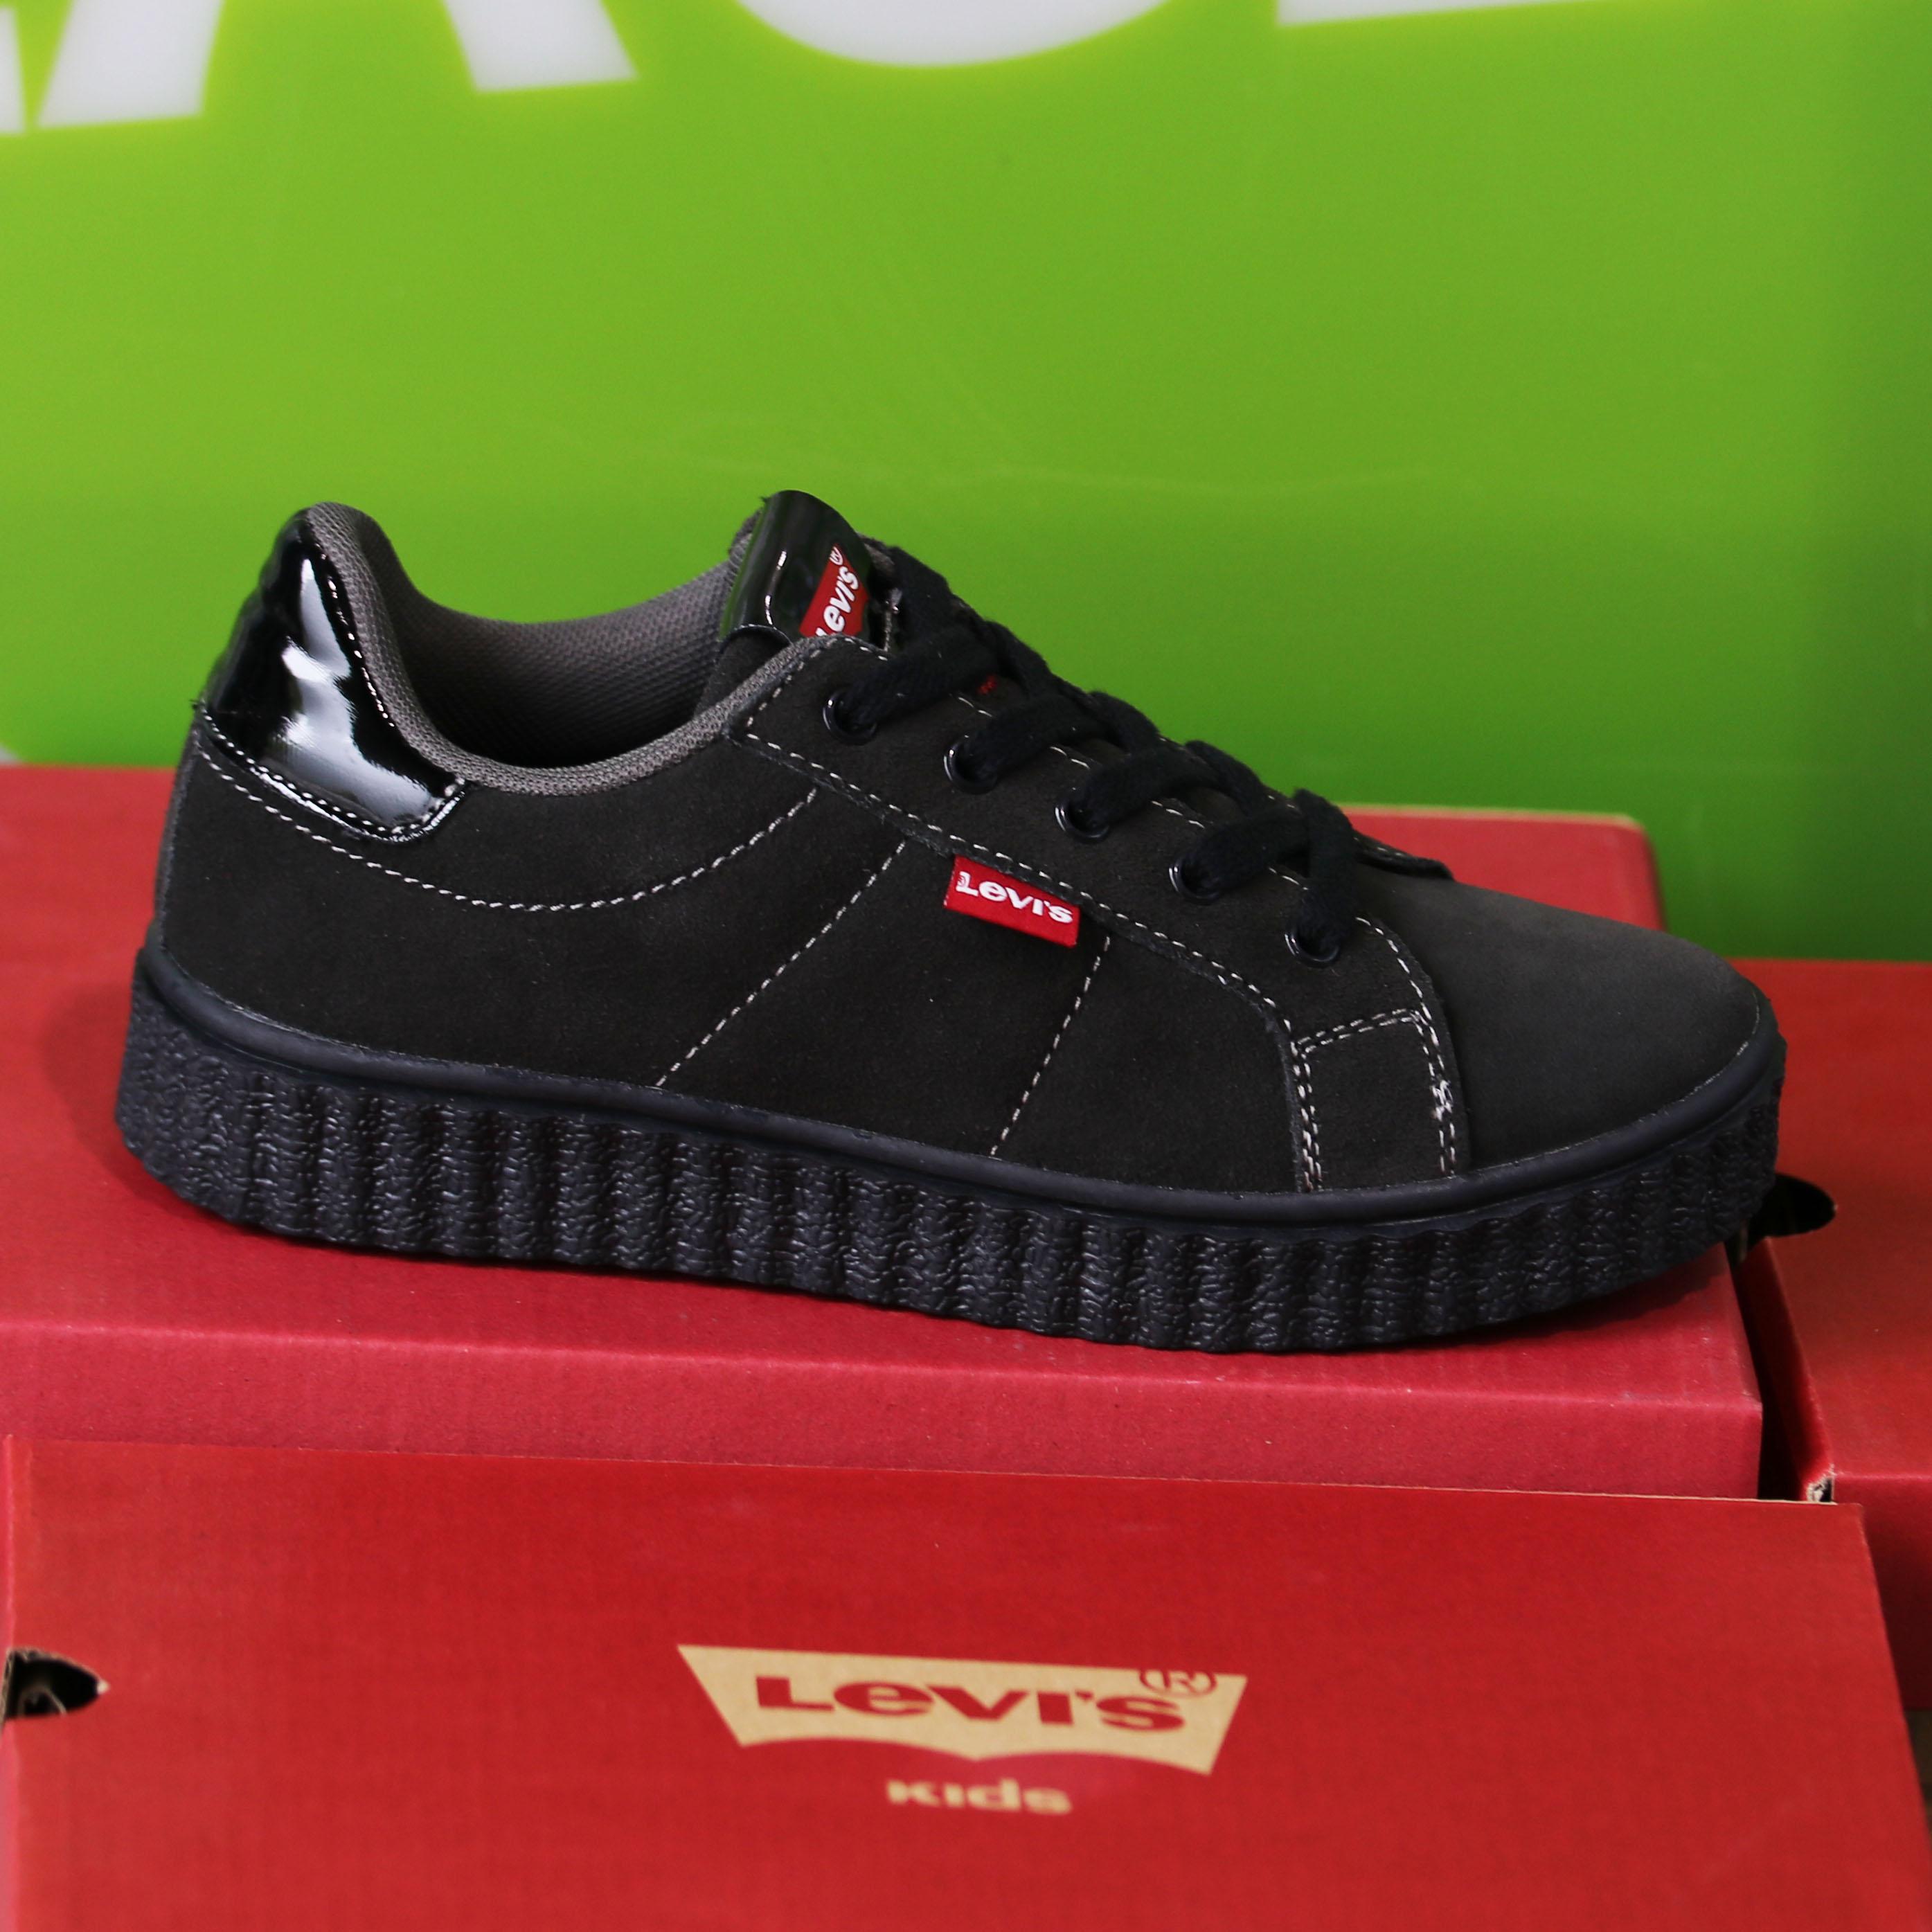 levis kids – new england sort sneaker sko barn1